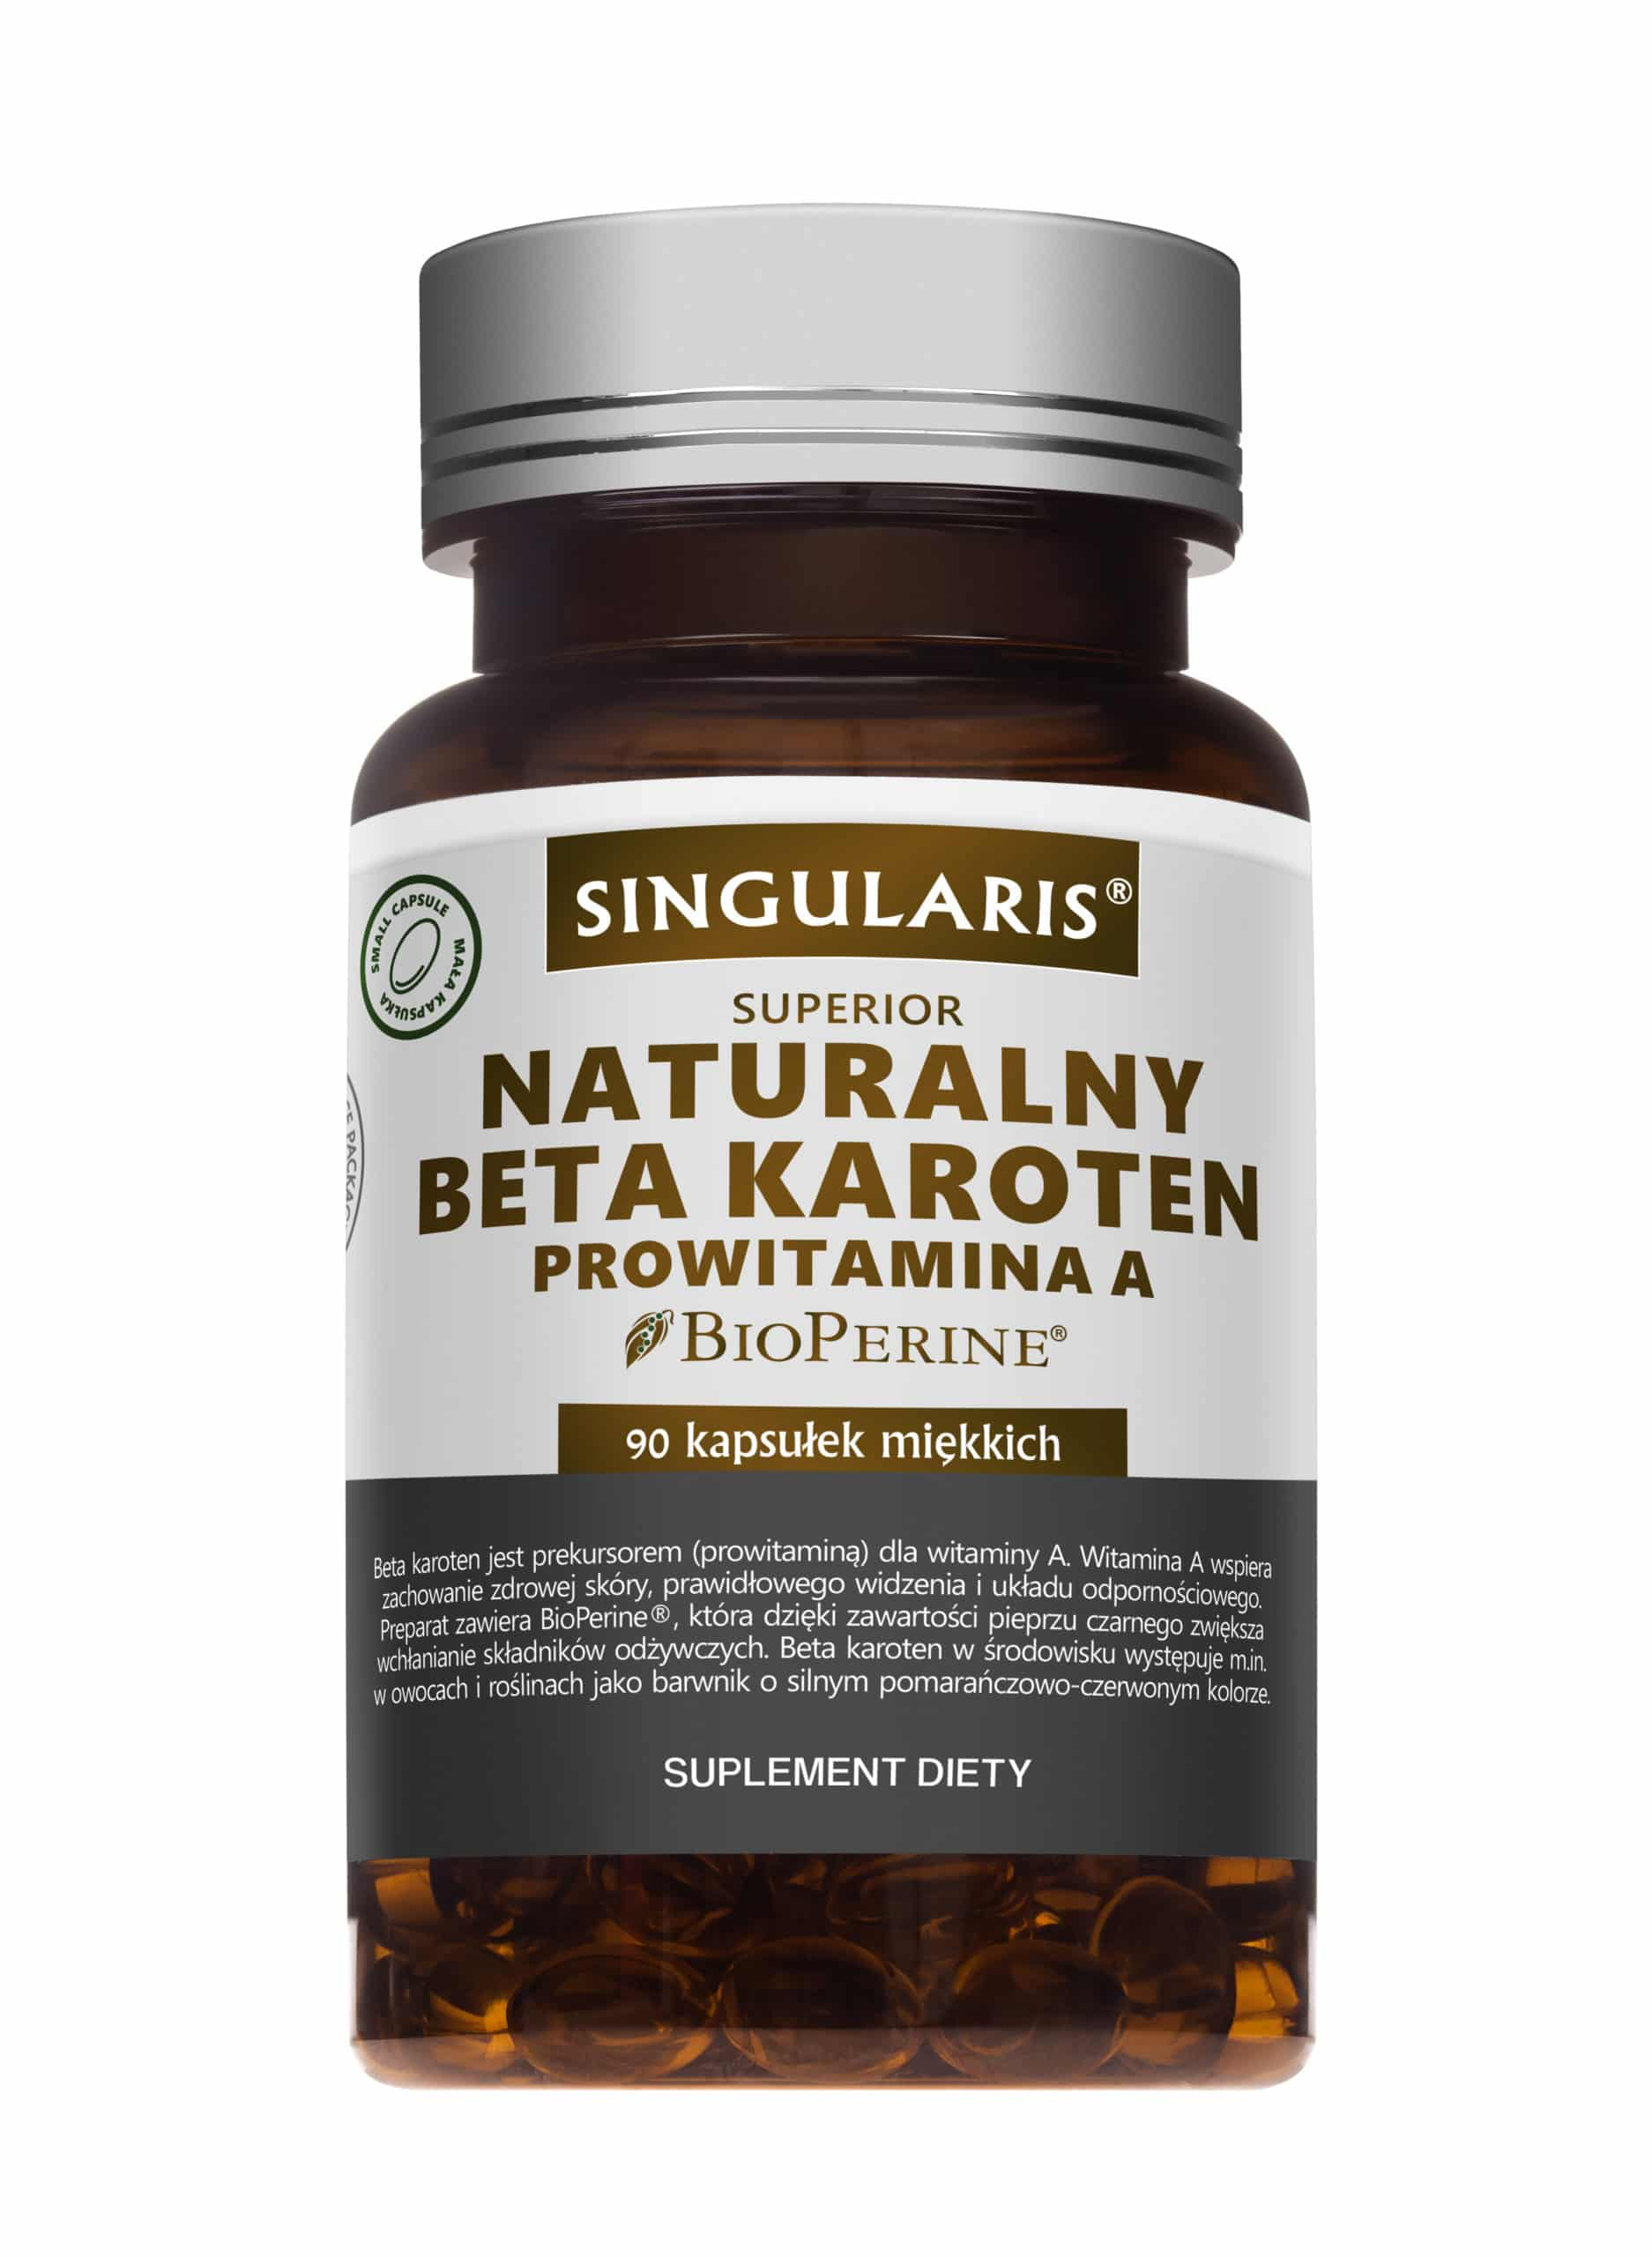 NATURALNY BETA KAROTEN PROWITAMINA A SINGULARIS® SUPERIOR - 90 kapsułek wegańskich